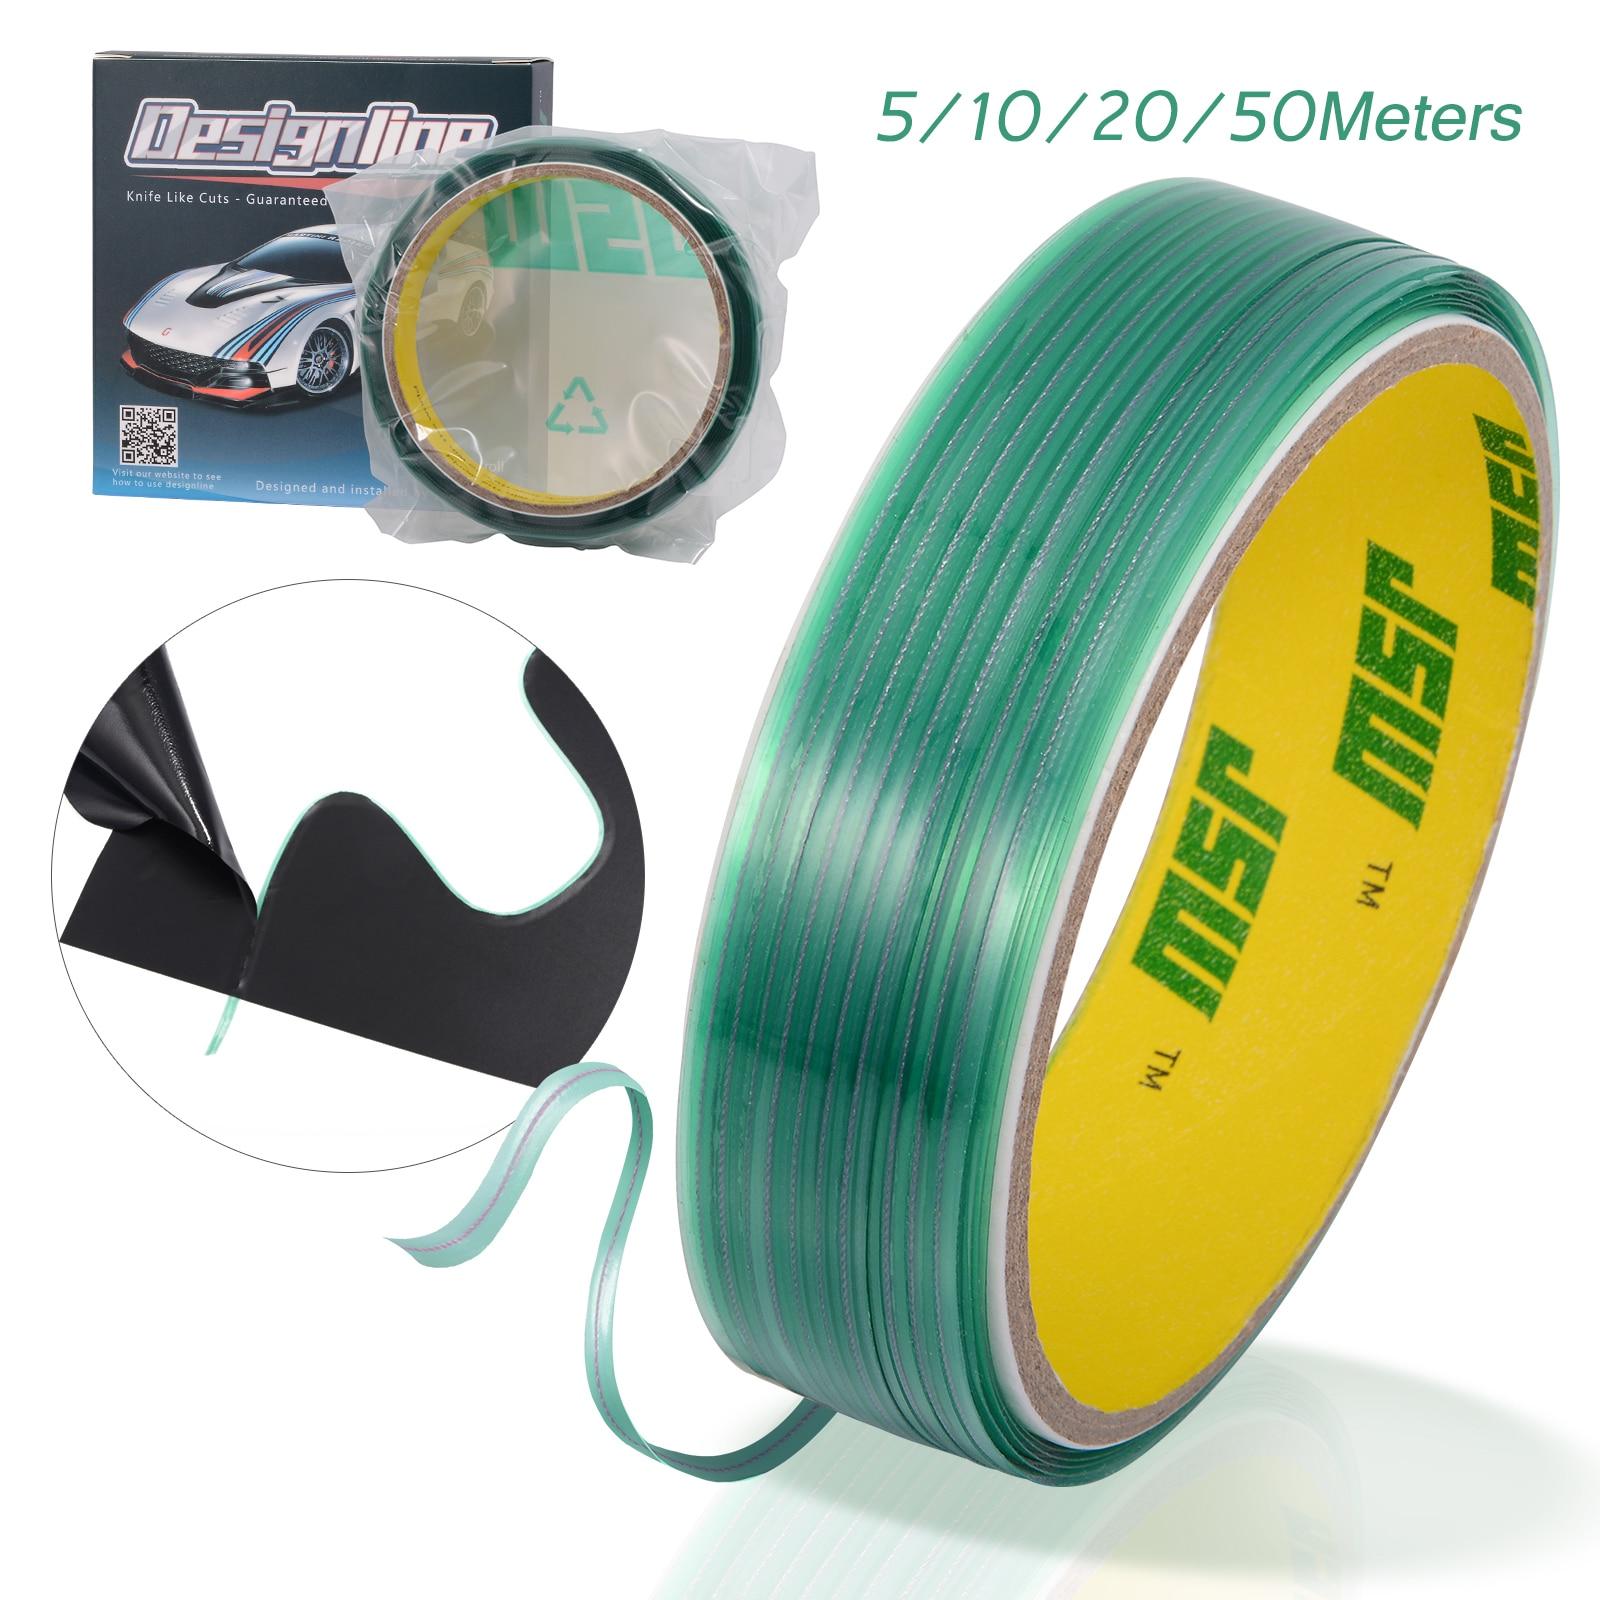 EHDIS 5/10/20/50m Knifeless Tape Design Line Car Accessories Vinyl Film Sticker Cutting Tape Window Tint Cutter Wrapping Tool